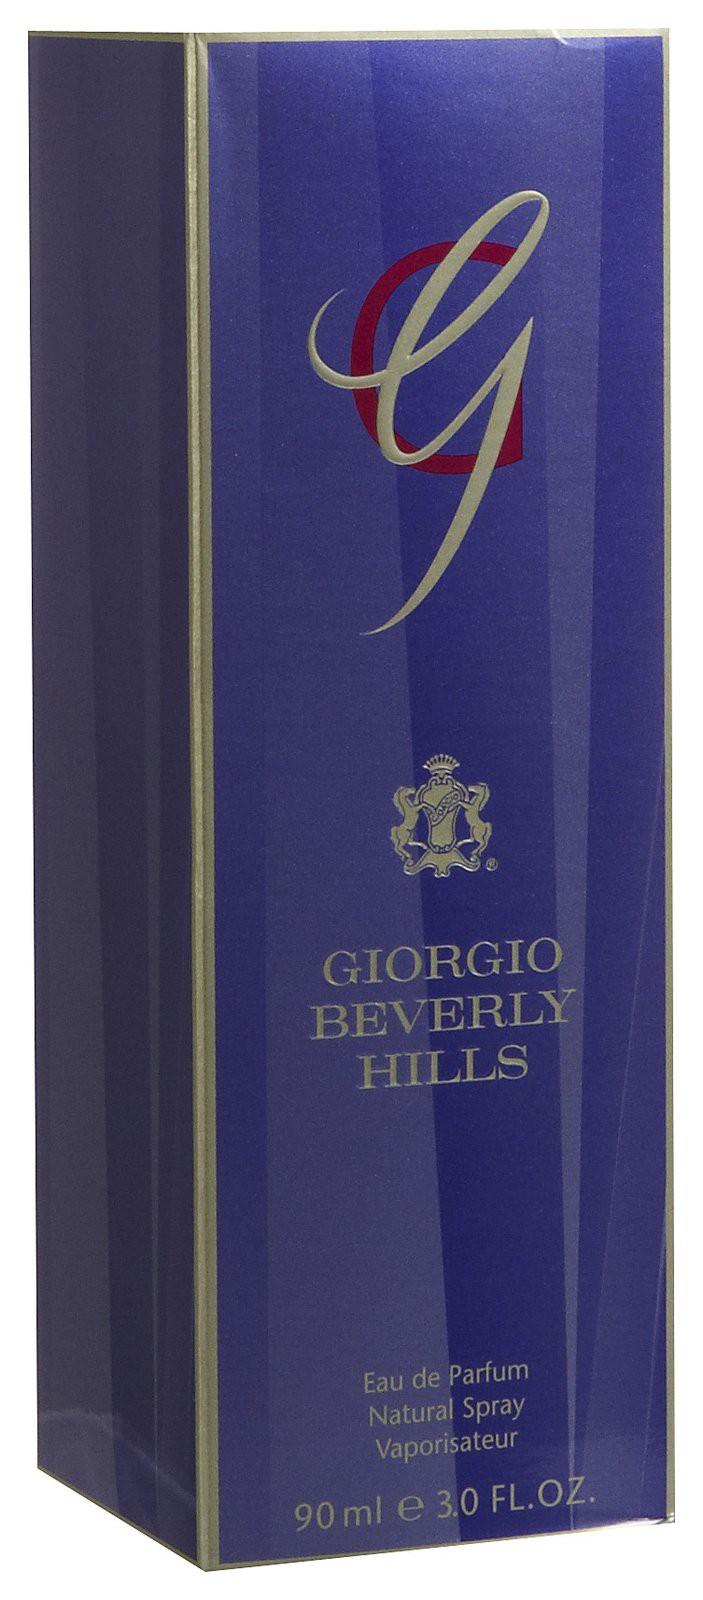 Giorgio Beverly Hills G аромат для женщин